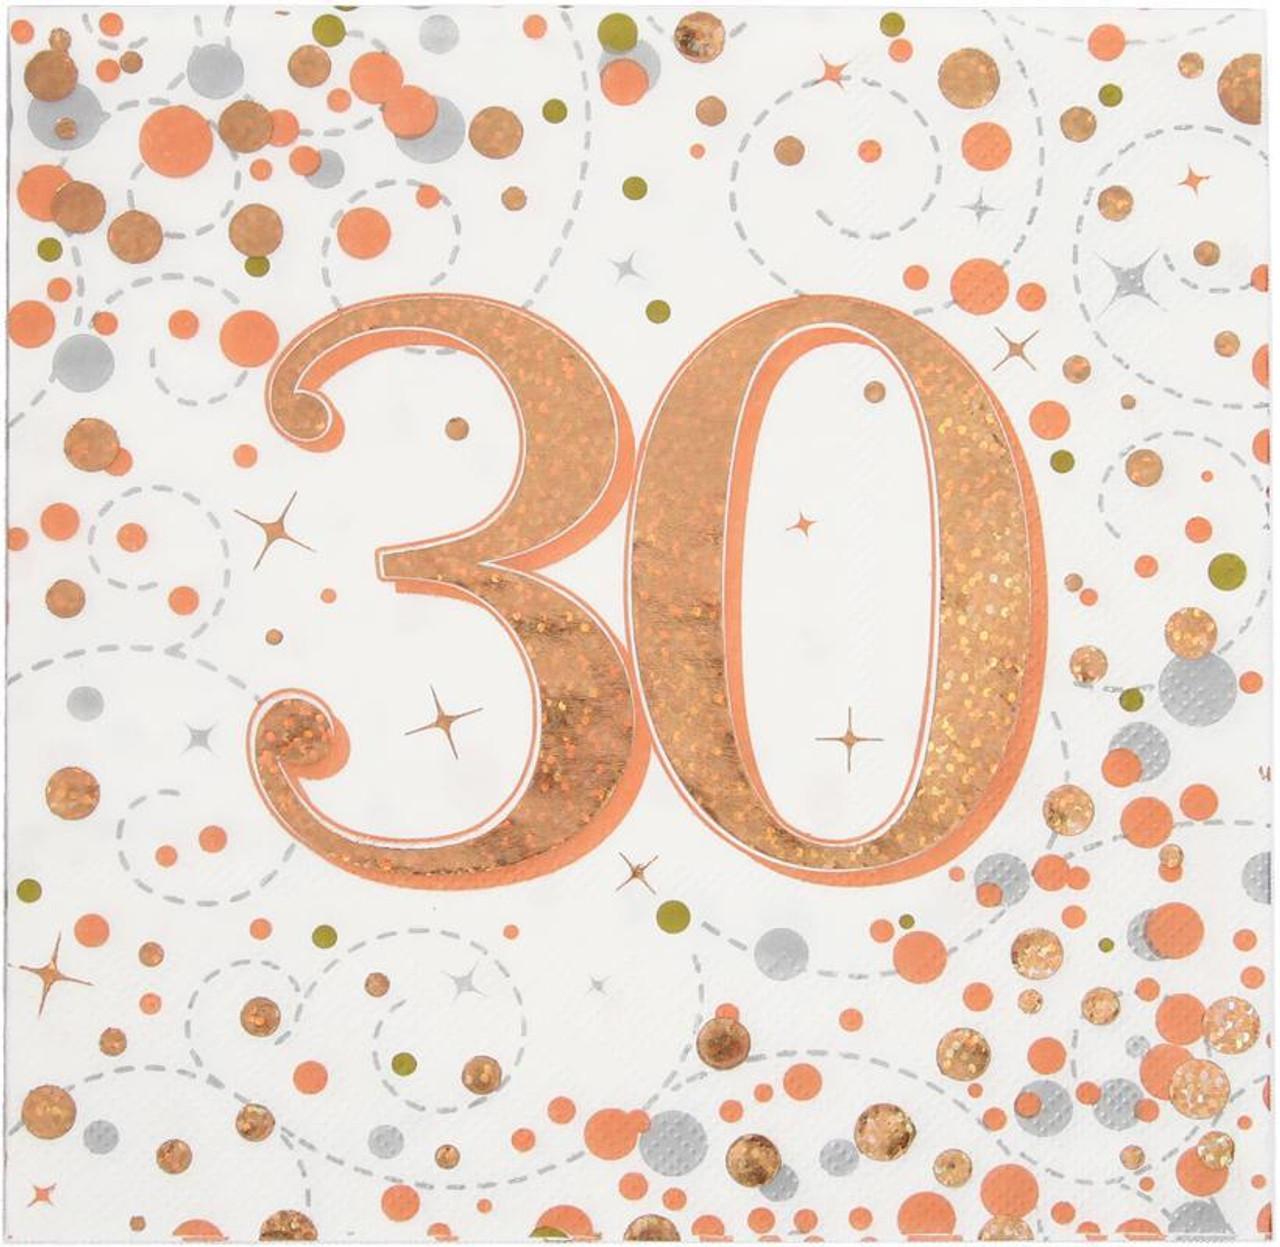 Age 30